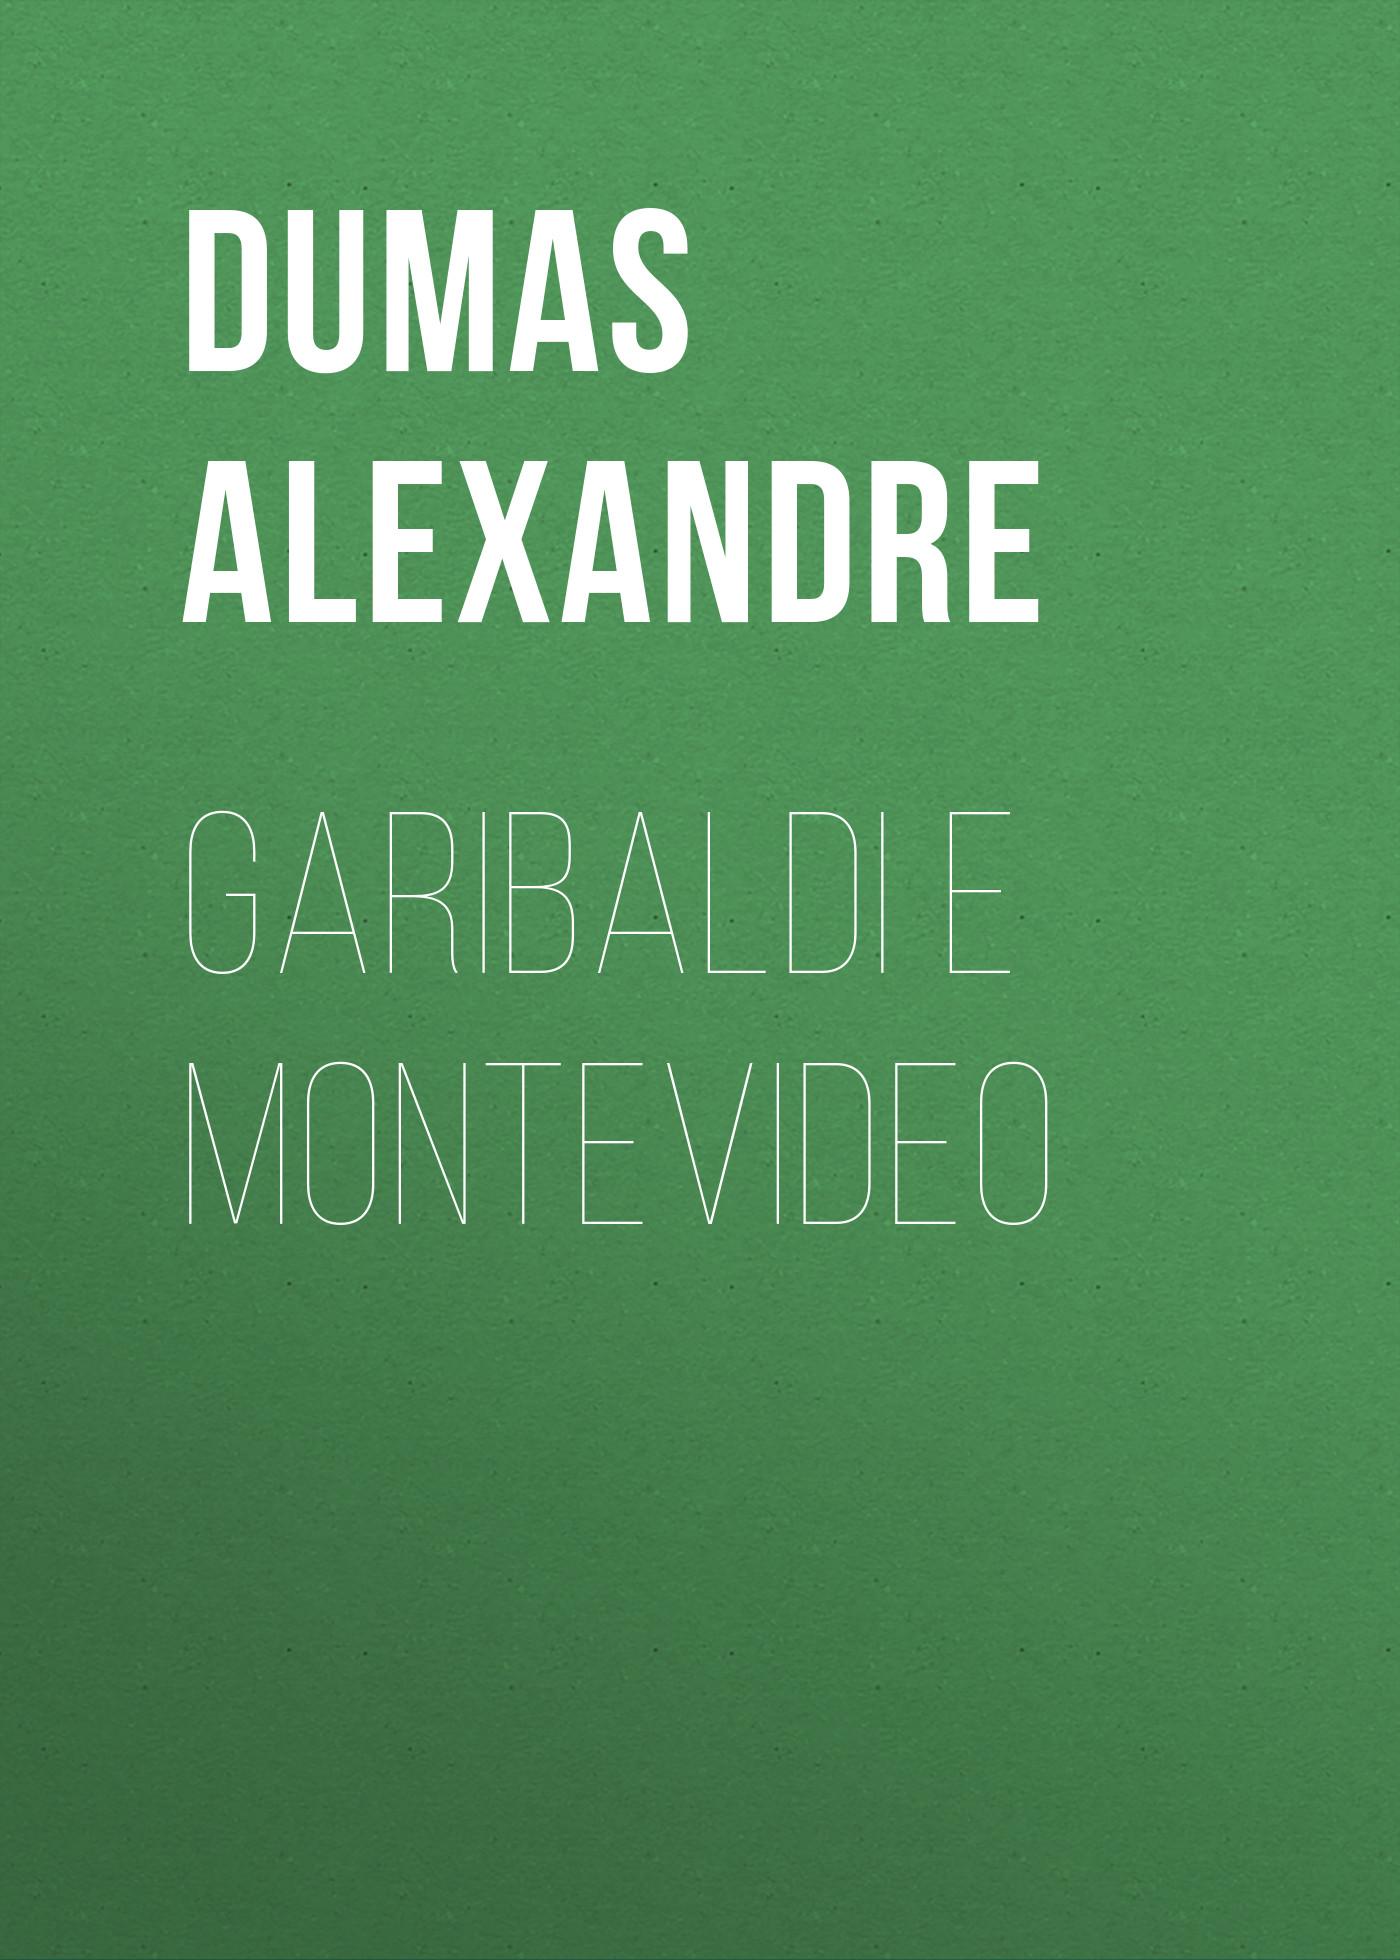 Александр Дюма Garibaldi e Montevideo